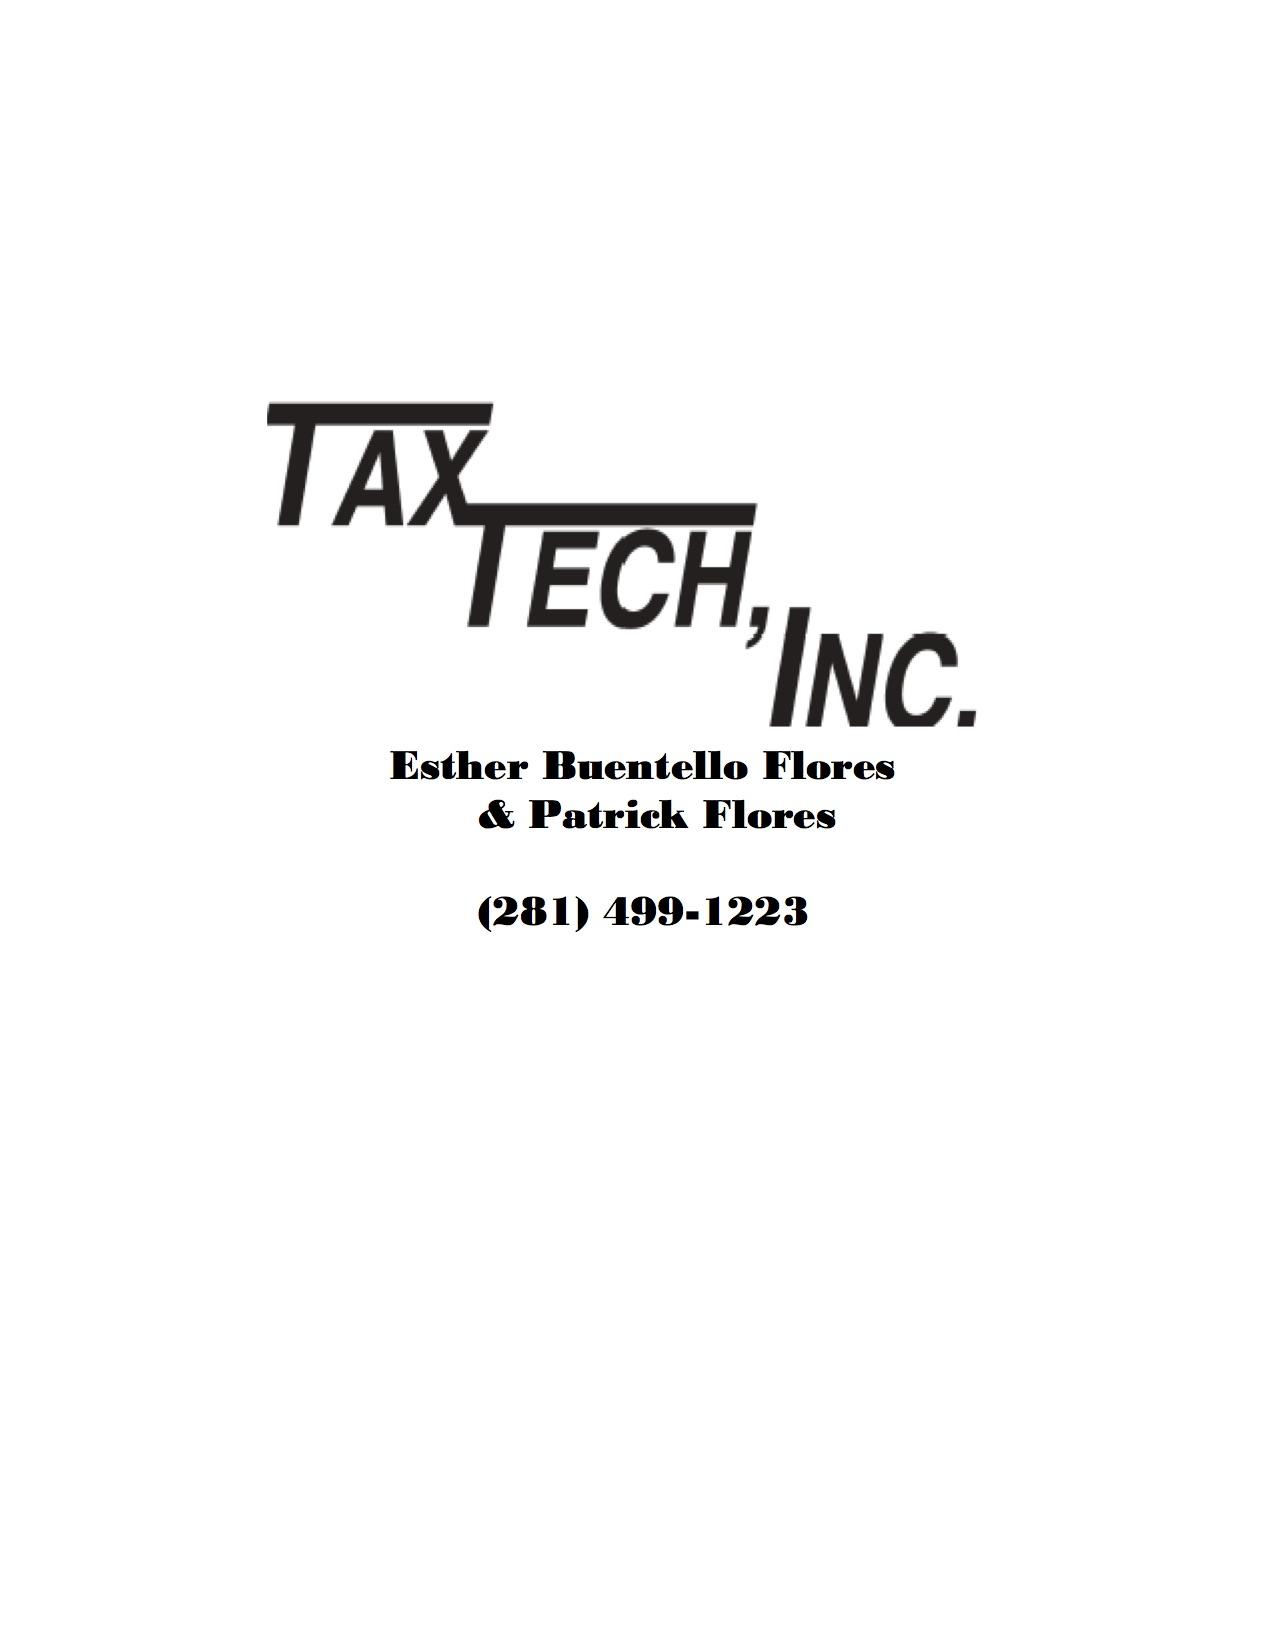 Tax Tech2.jpg